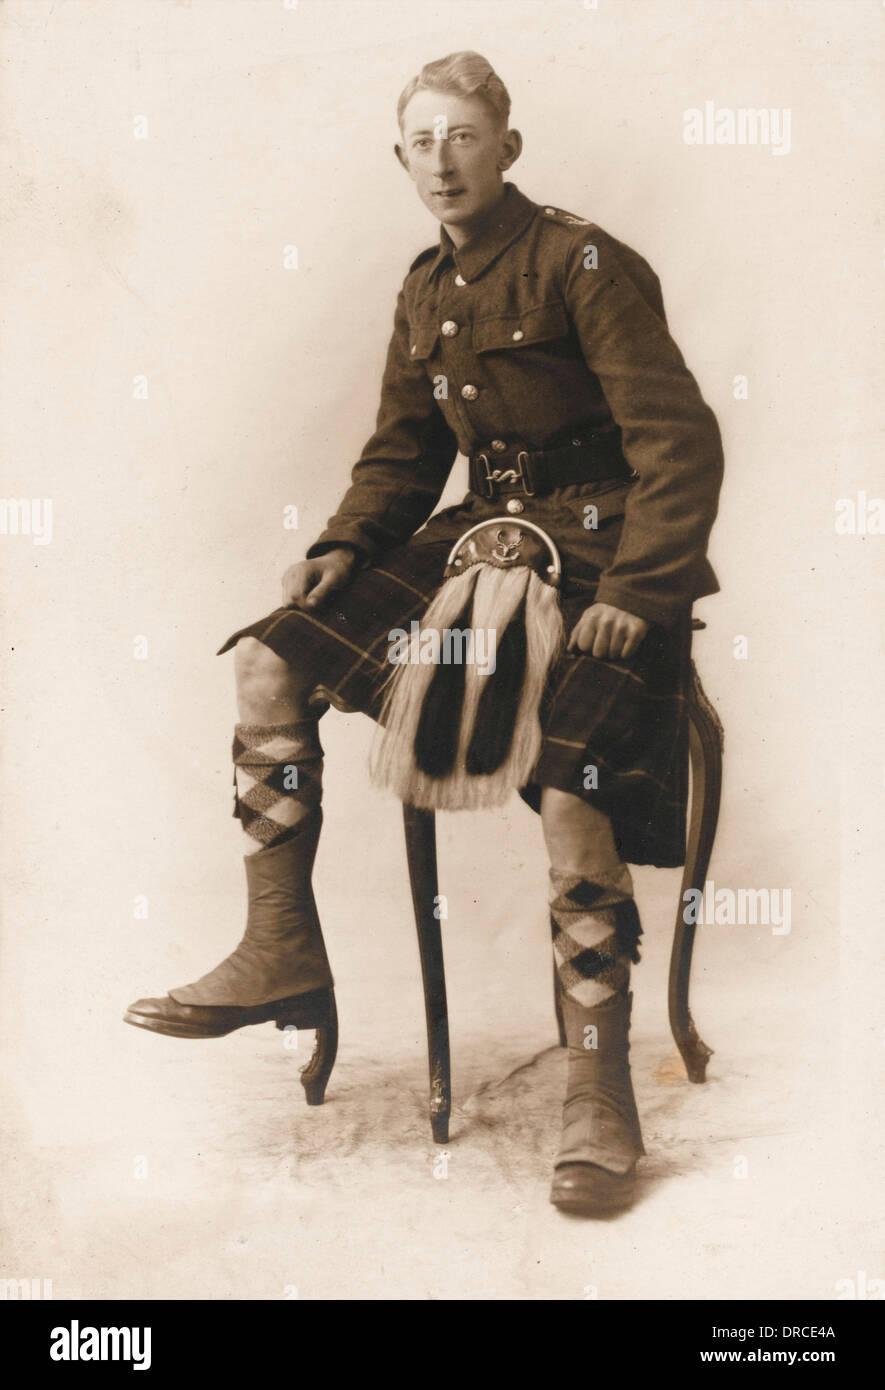 A Seaforth Highlander - World War One - Stock Image